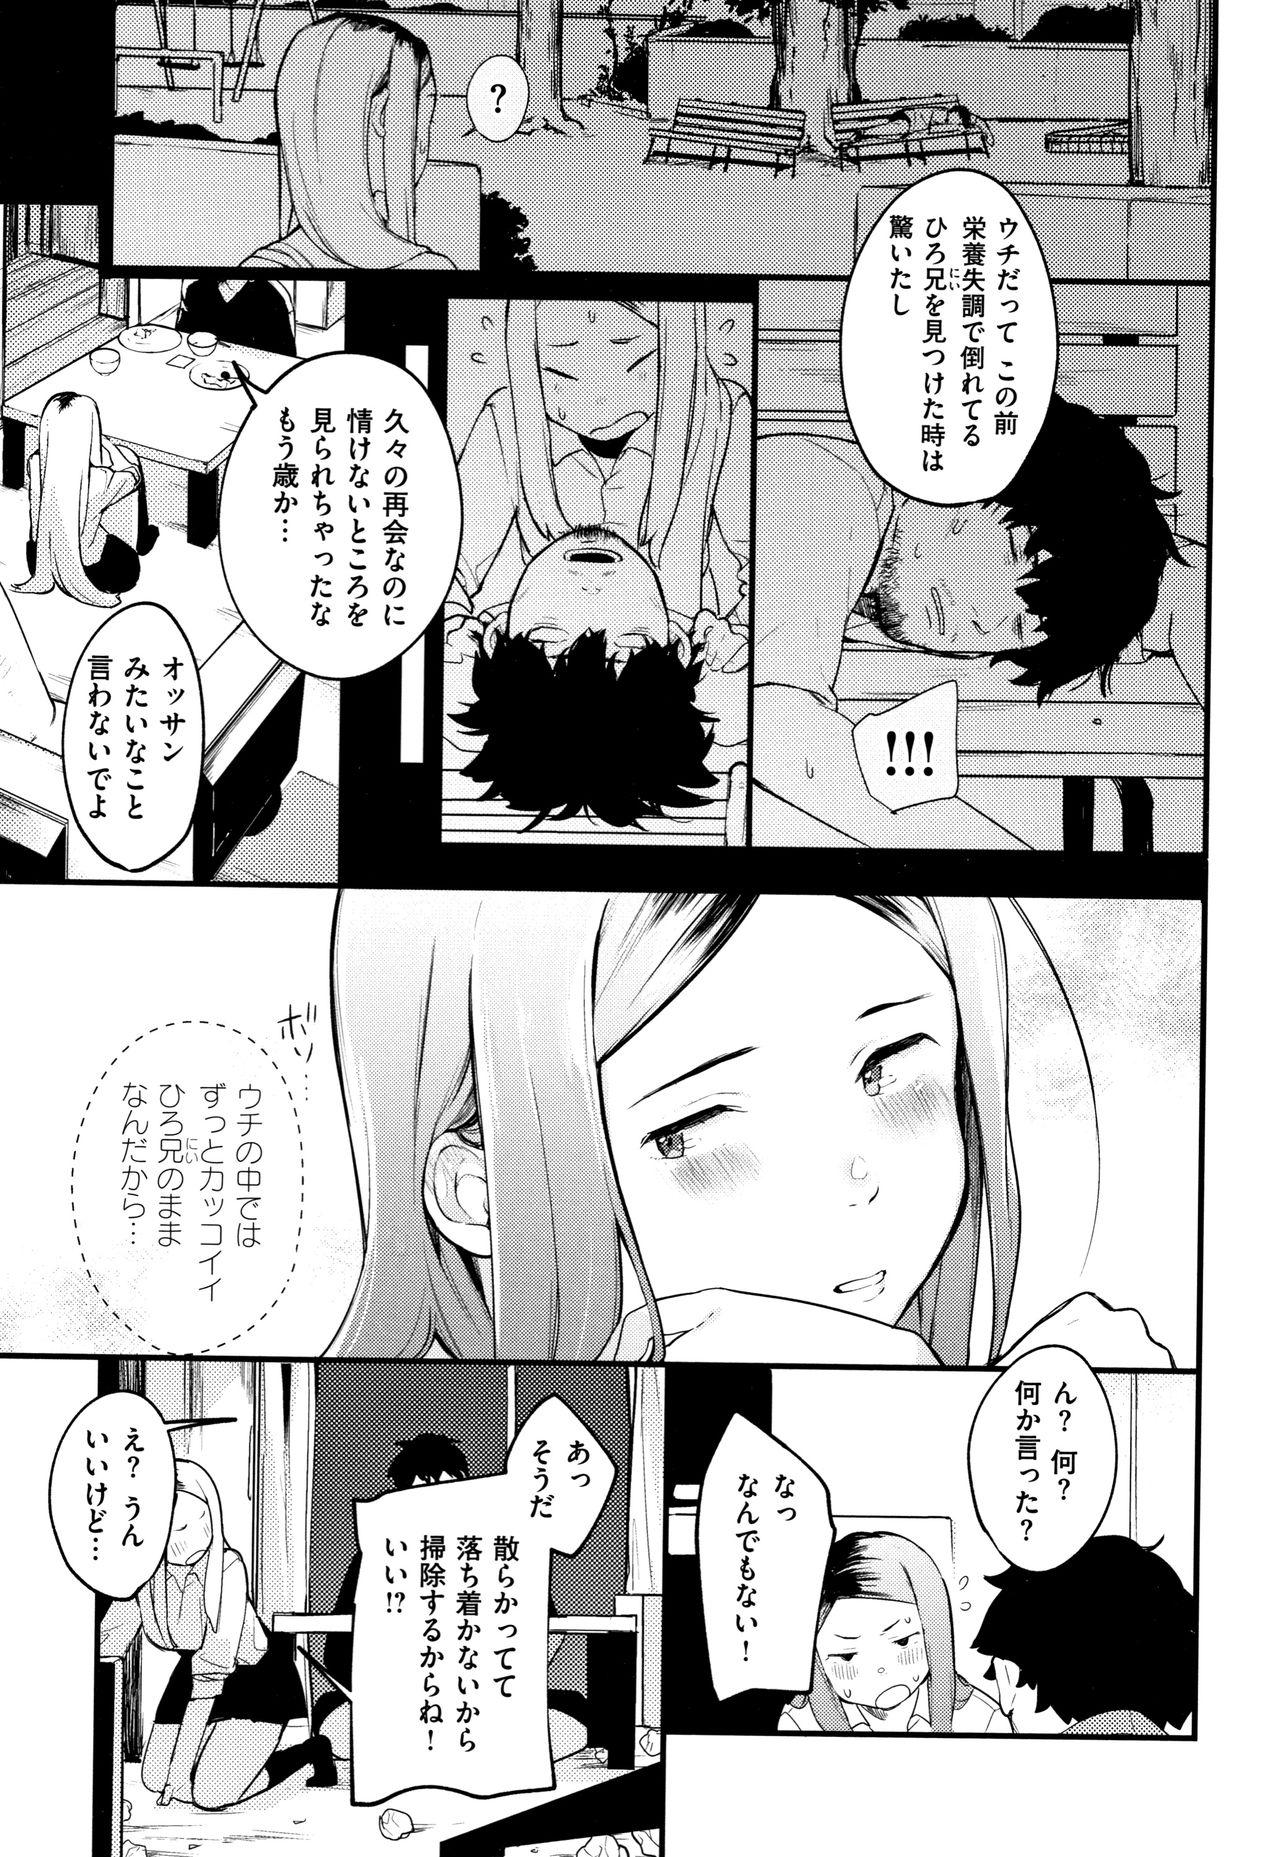 Haru to Ao - Our adolescence 13